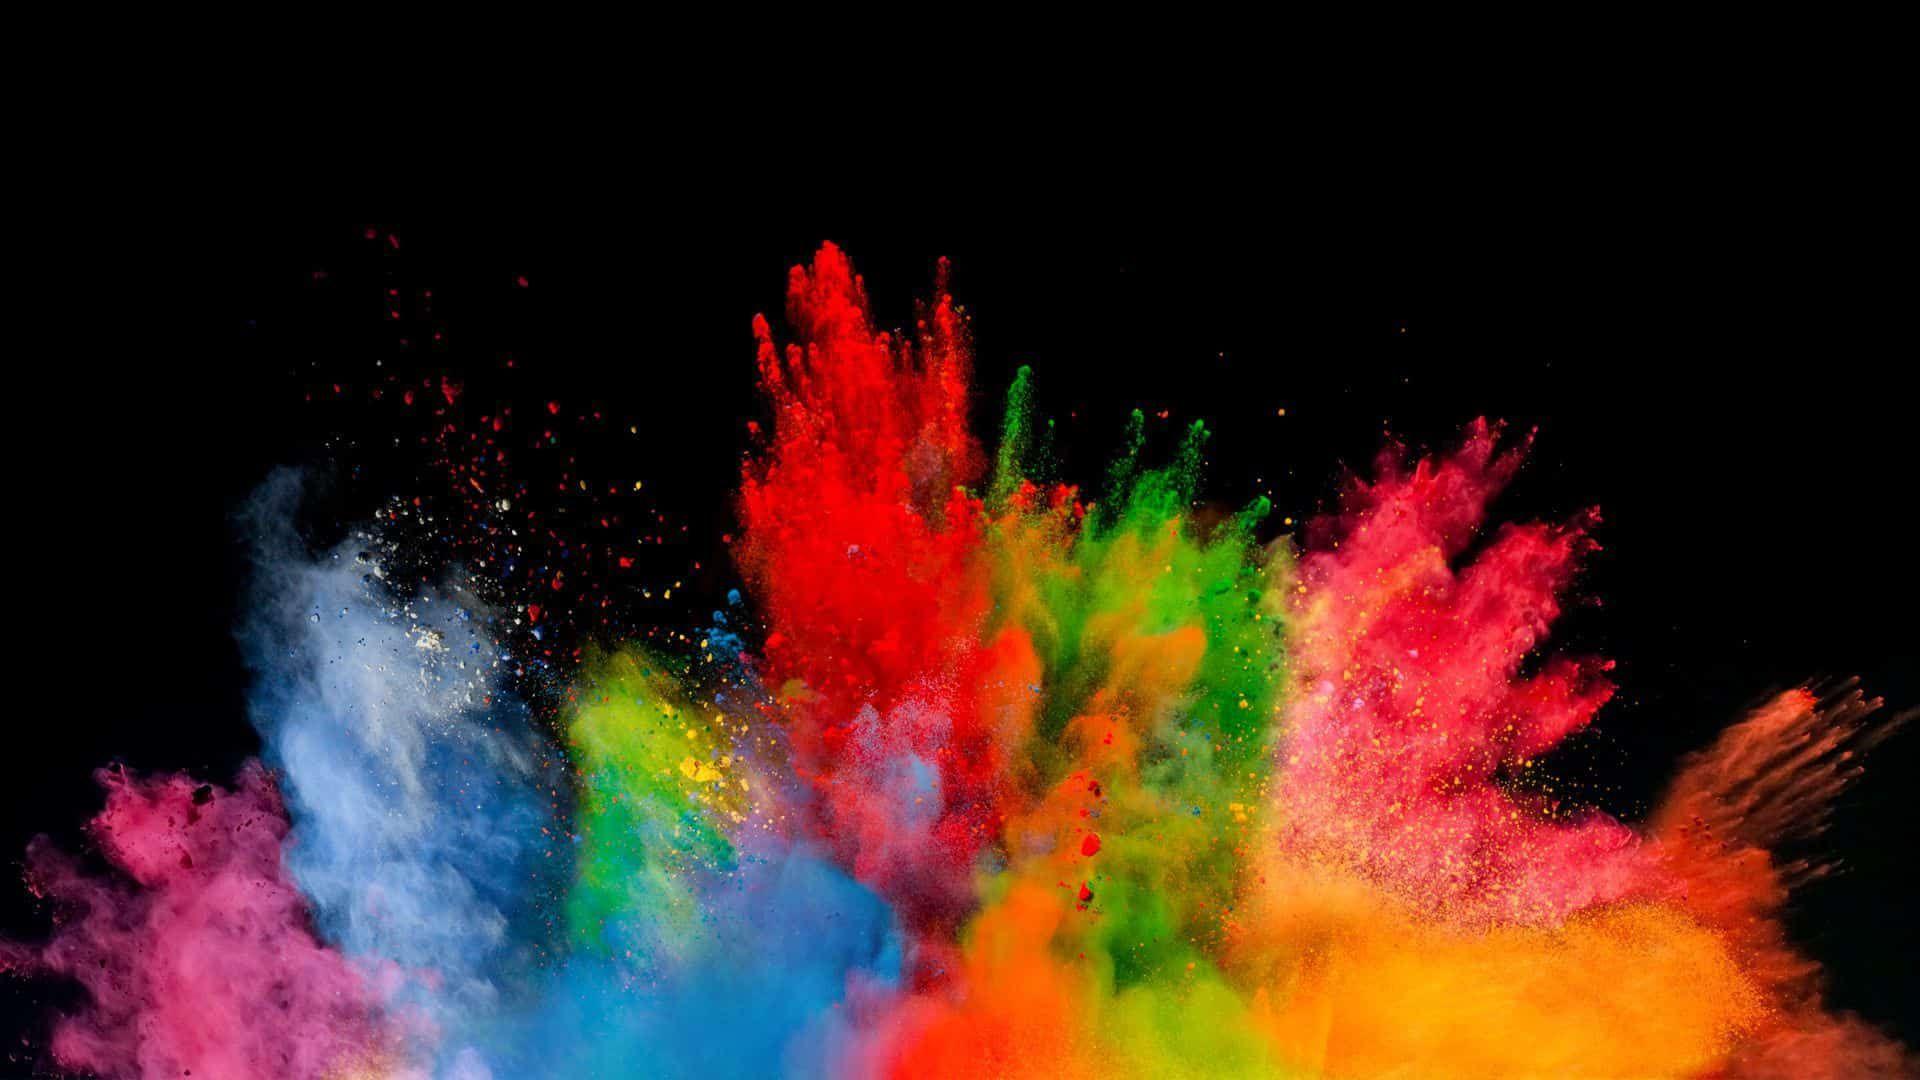 Rainbow hd wallpaper download